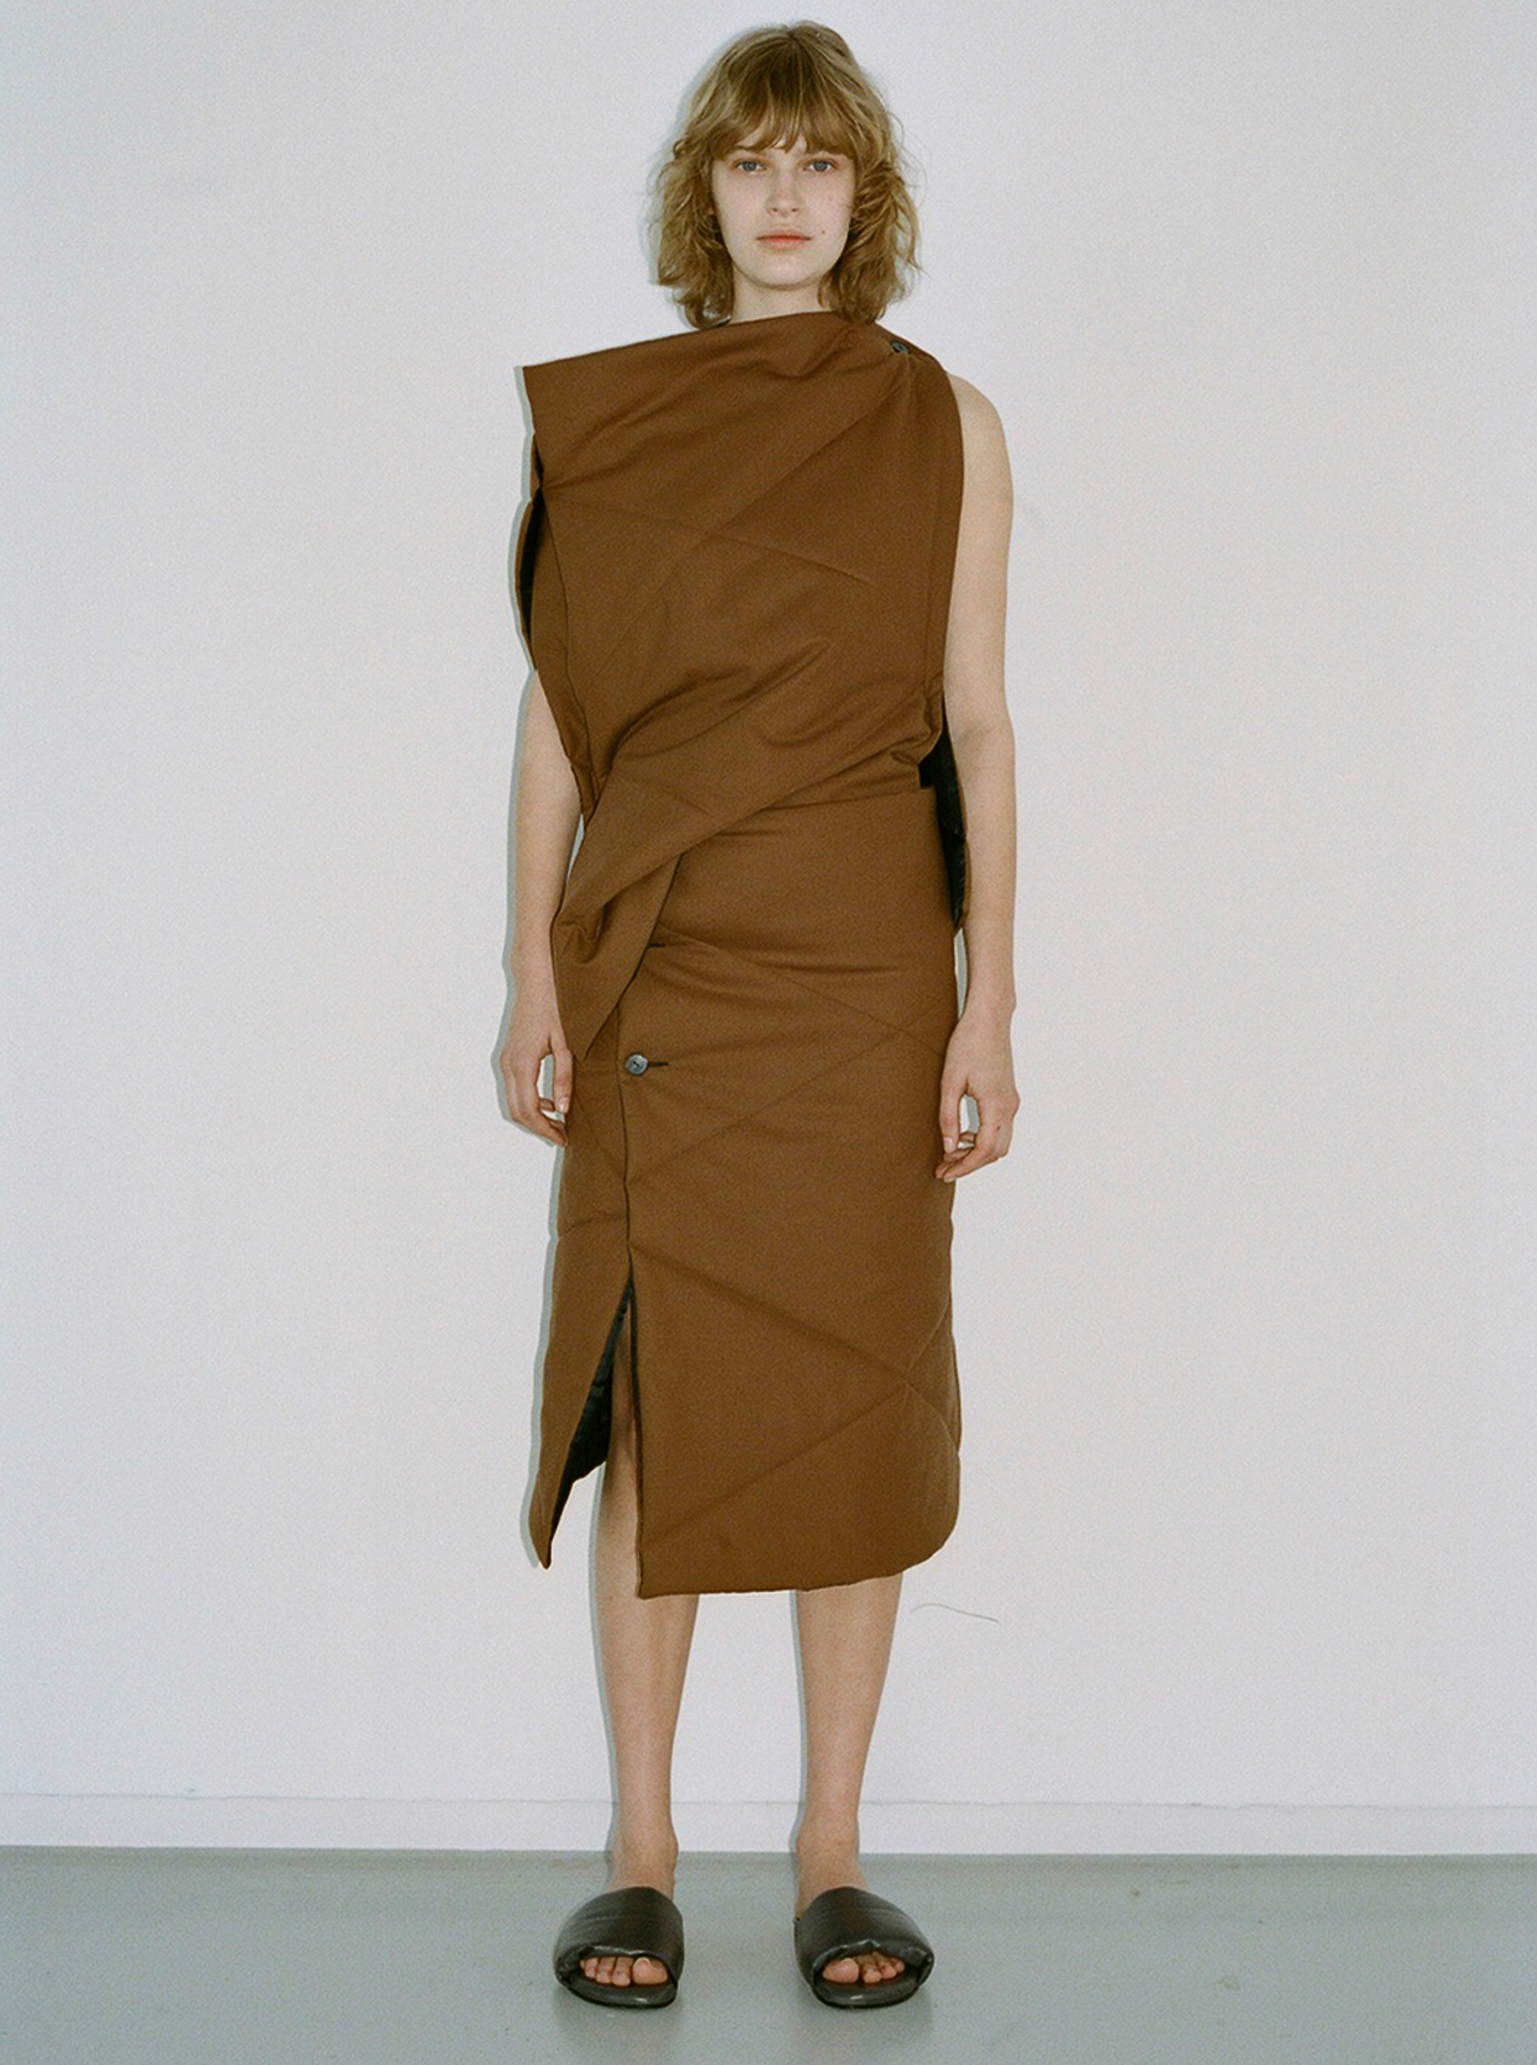 Gauchere Paris fashion week F/W 2021